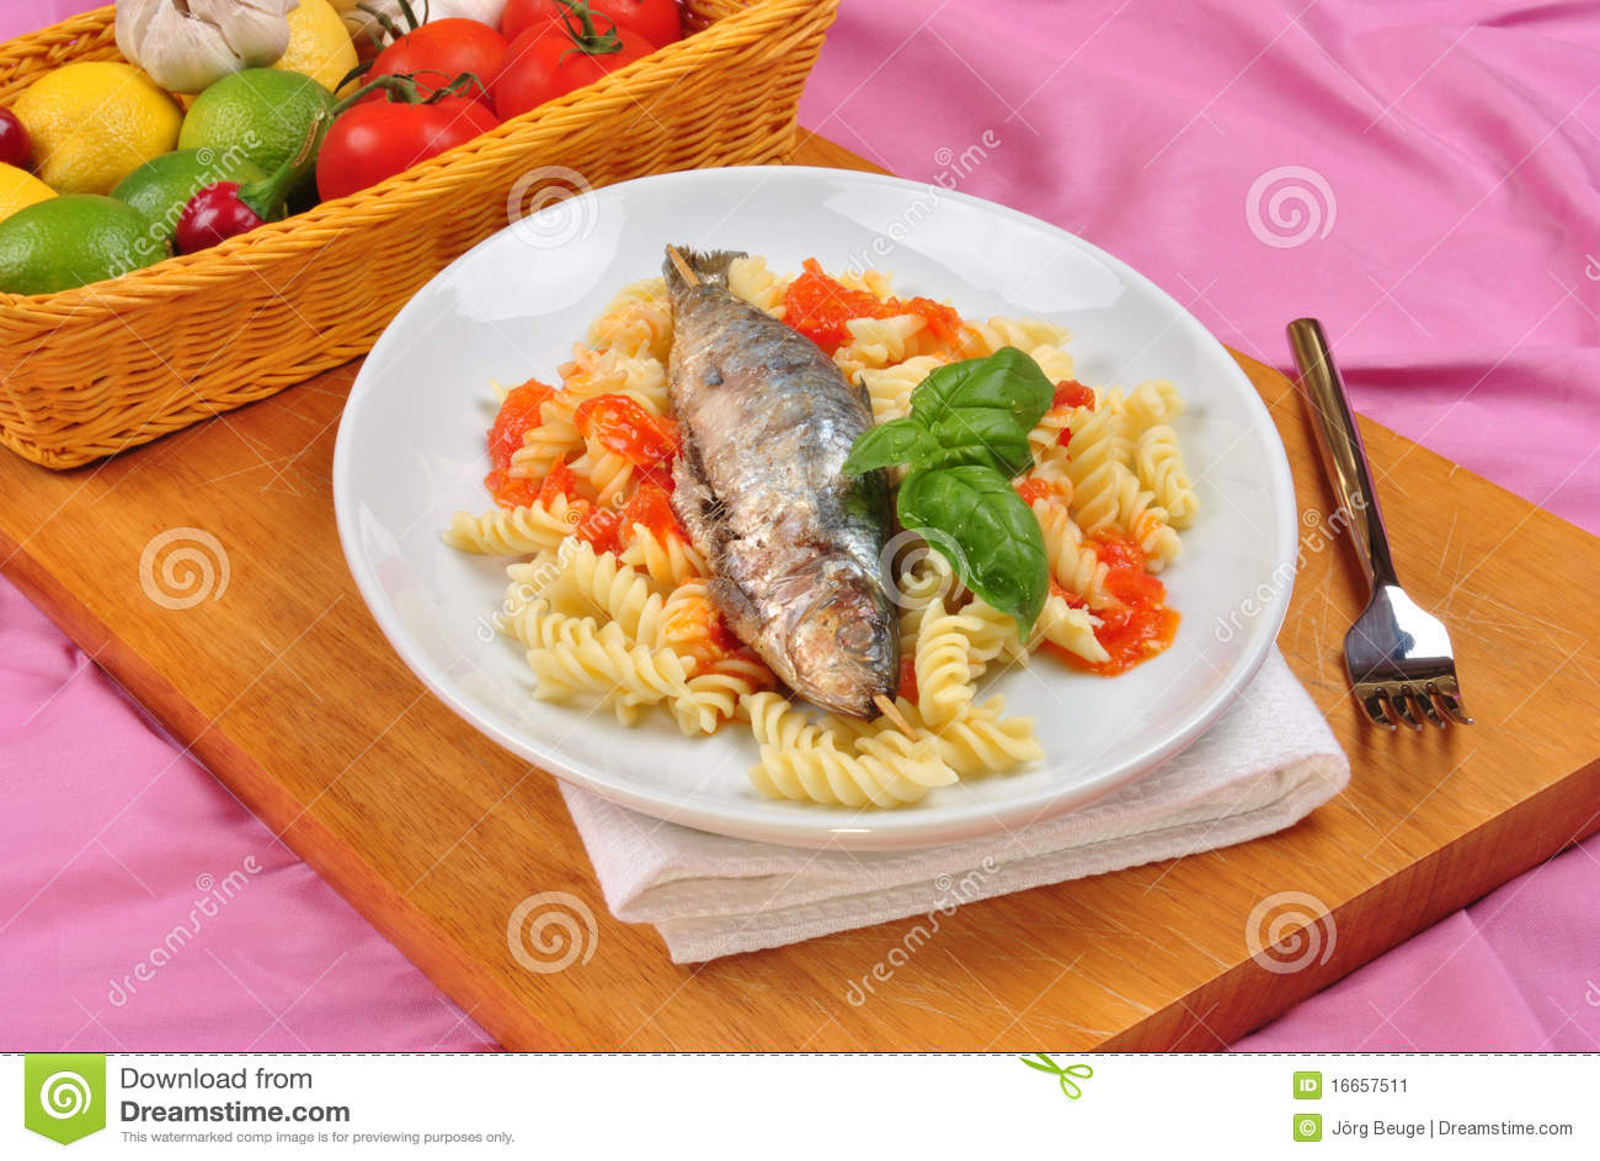 Grilled Sardine On Some Tomato Pasta Stock Image - Image: 16657511